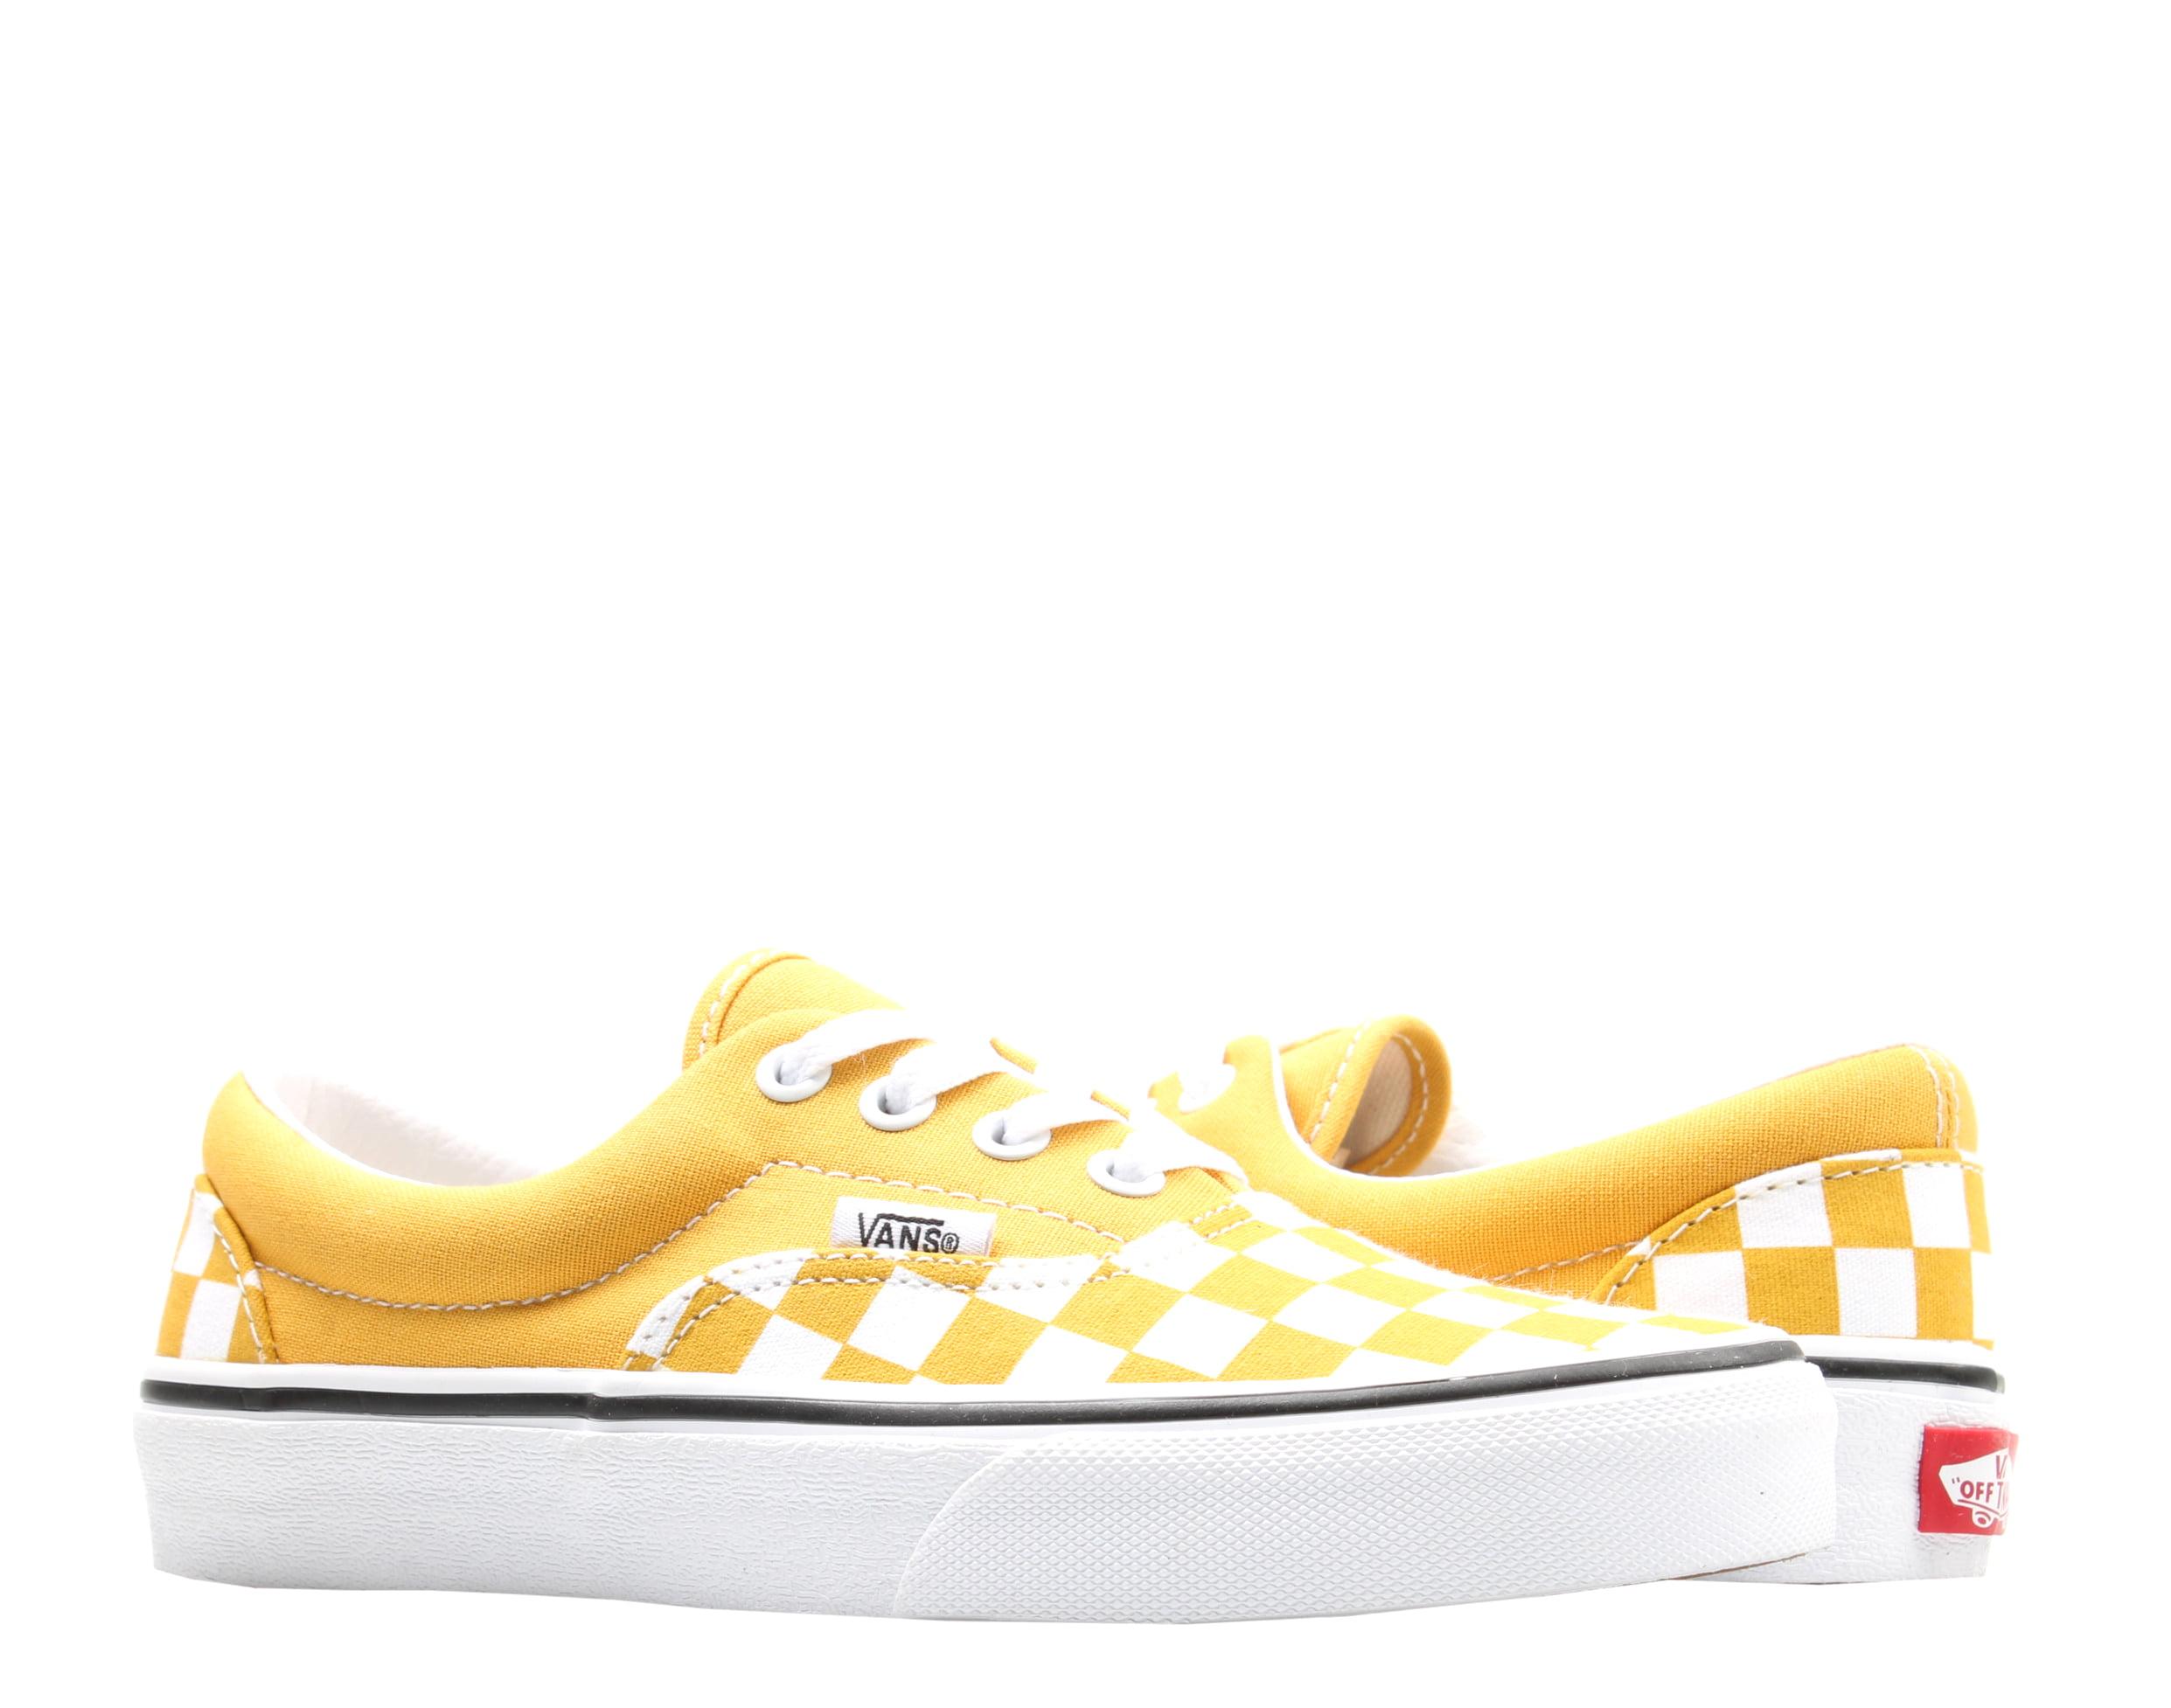 Vans Era Checkerboard Yolk Yellow/True